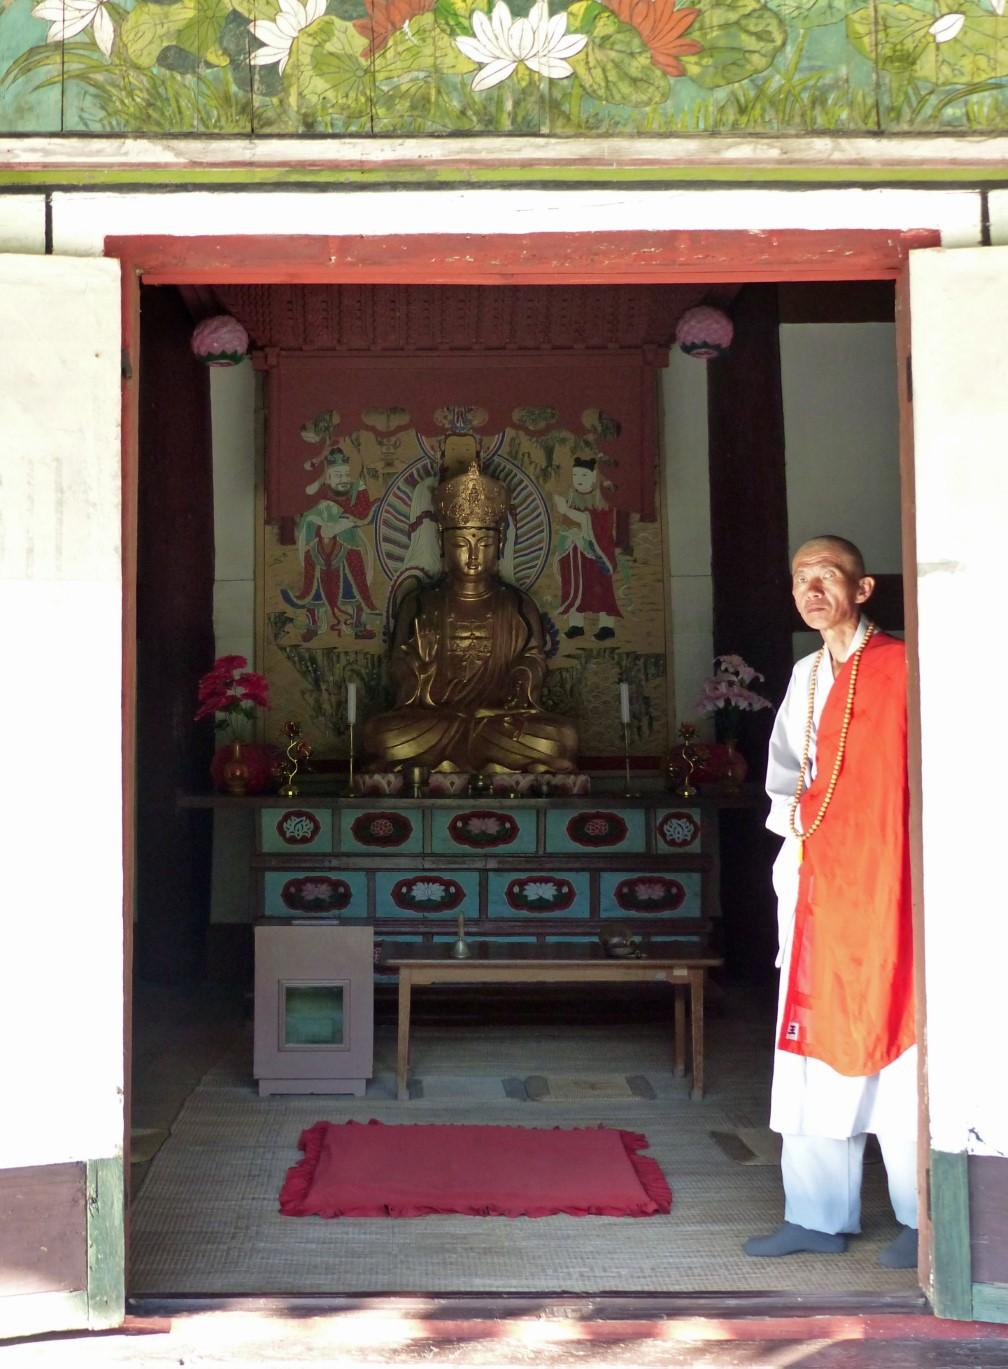 Buddhist monk at door of temple